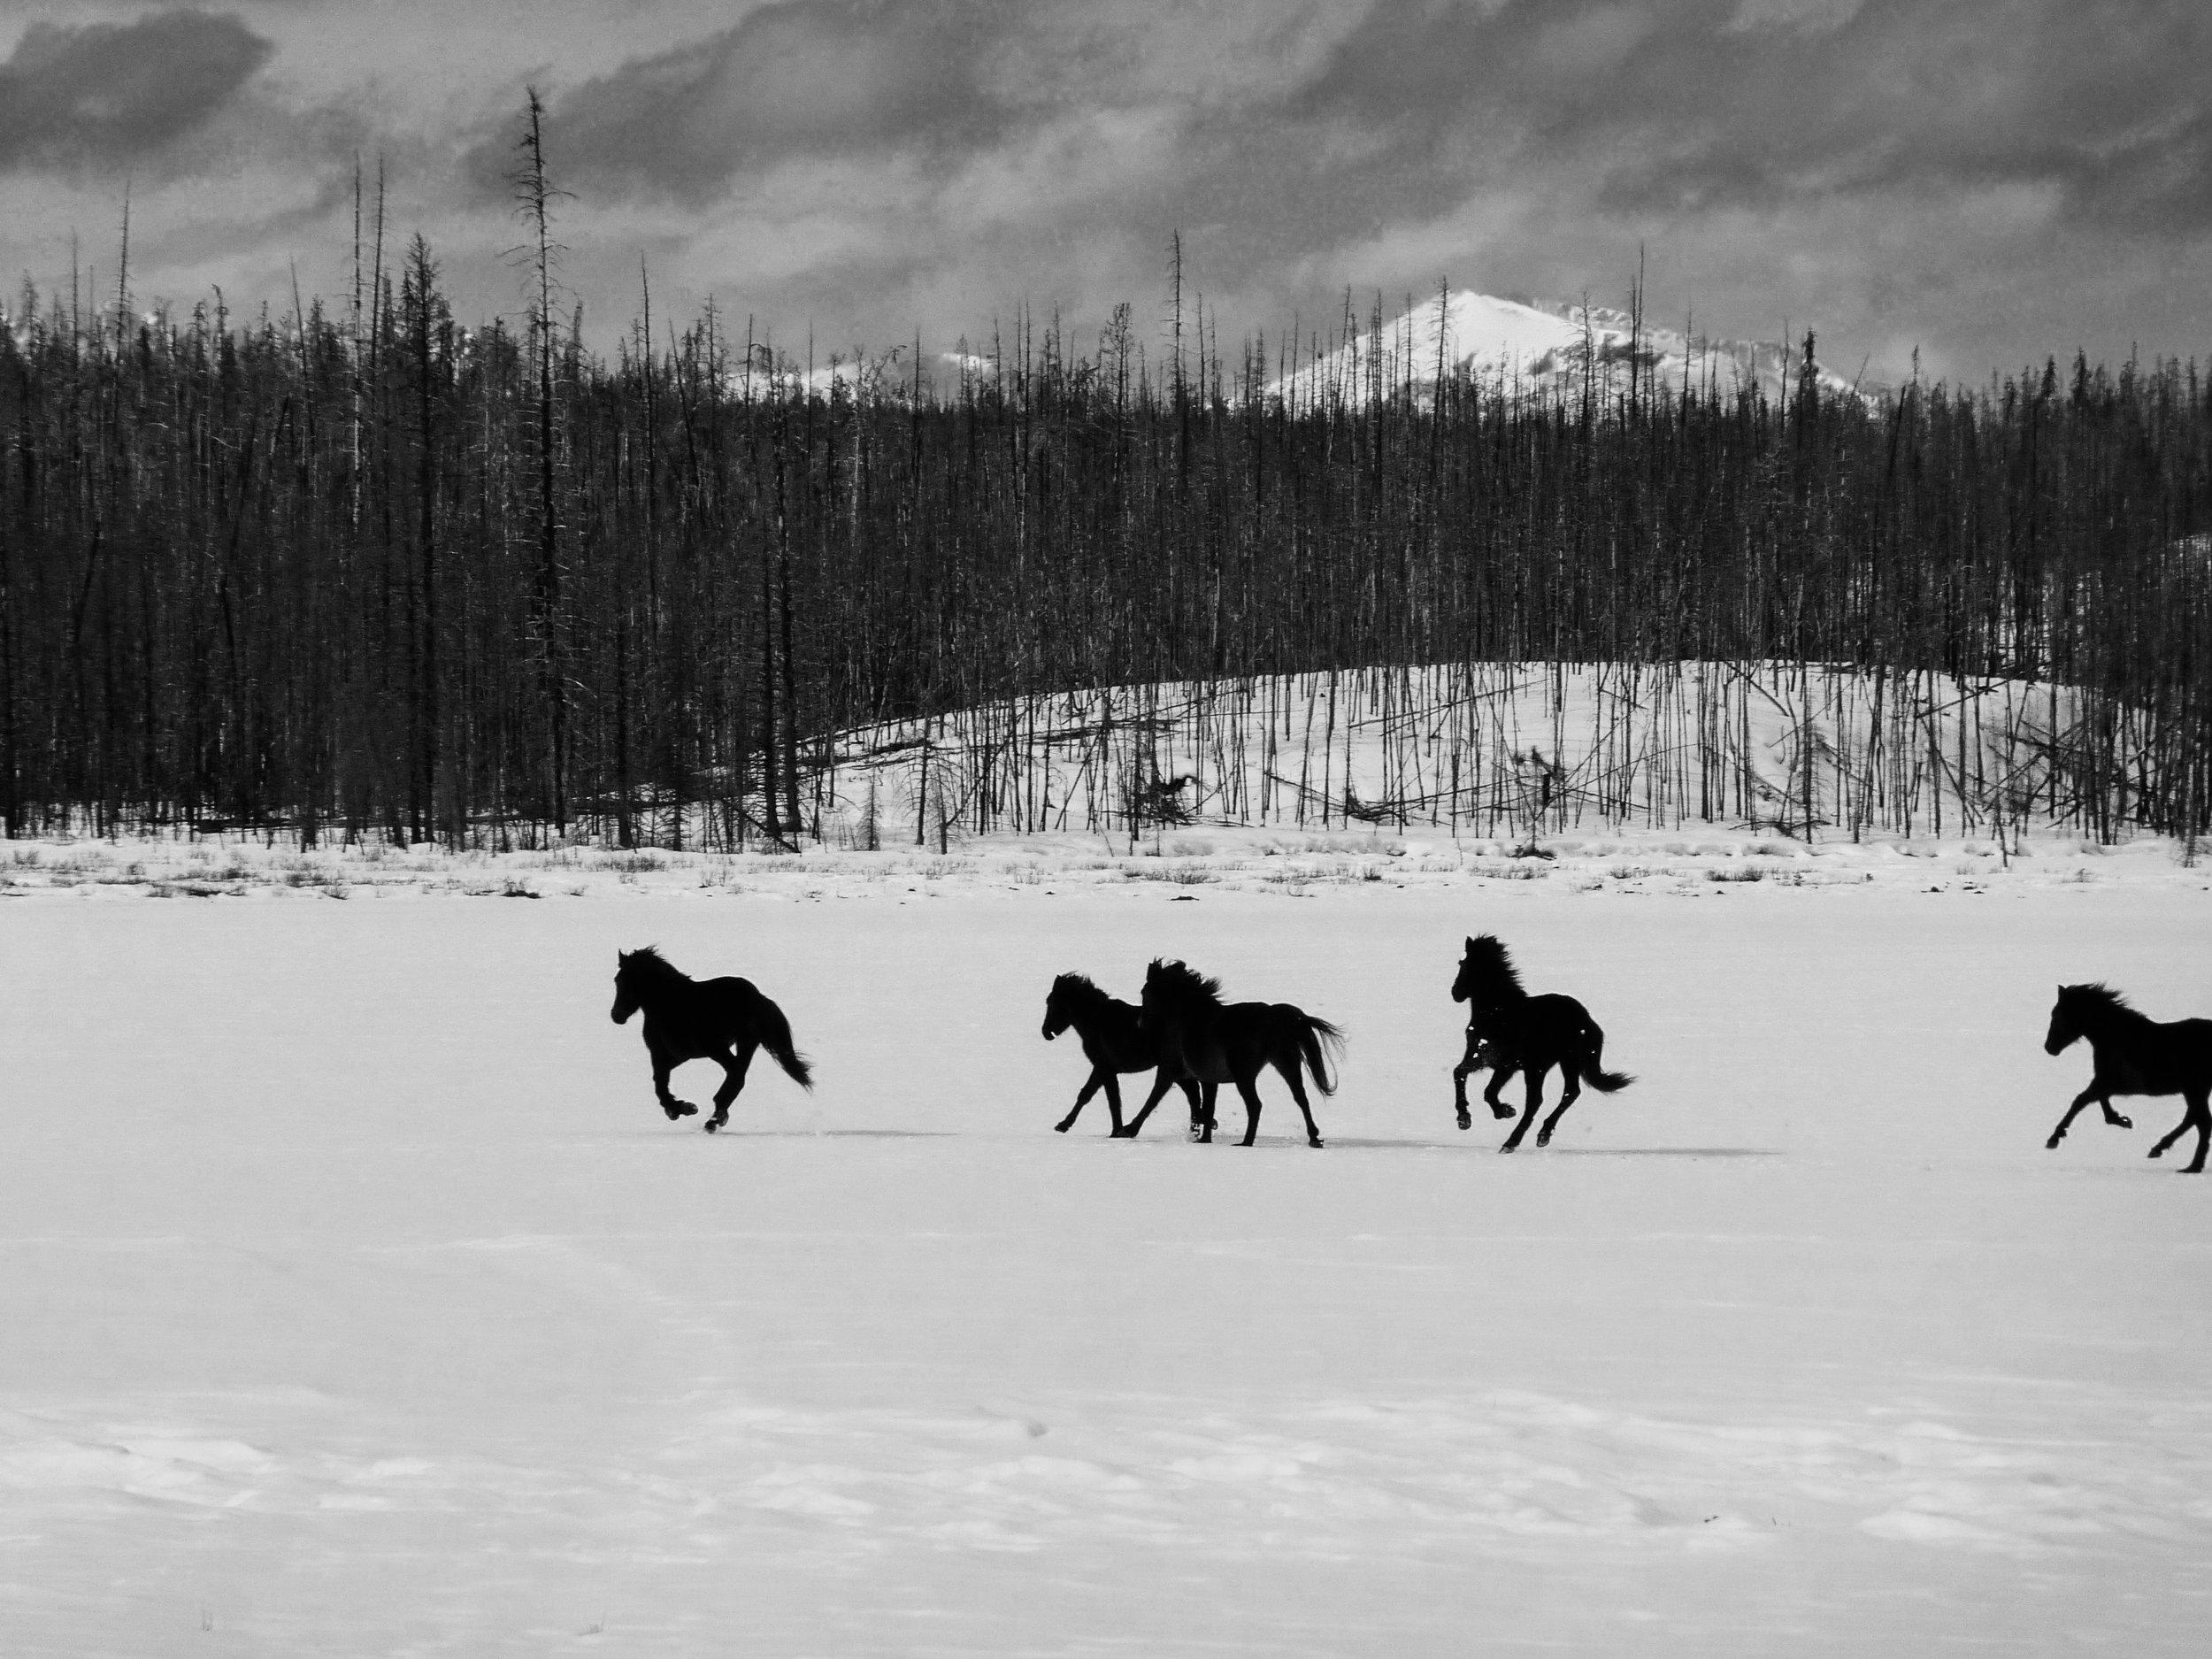 Wild Horses on meadow.jpg